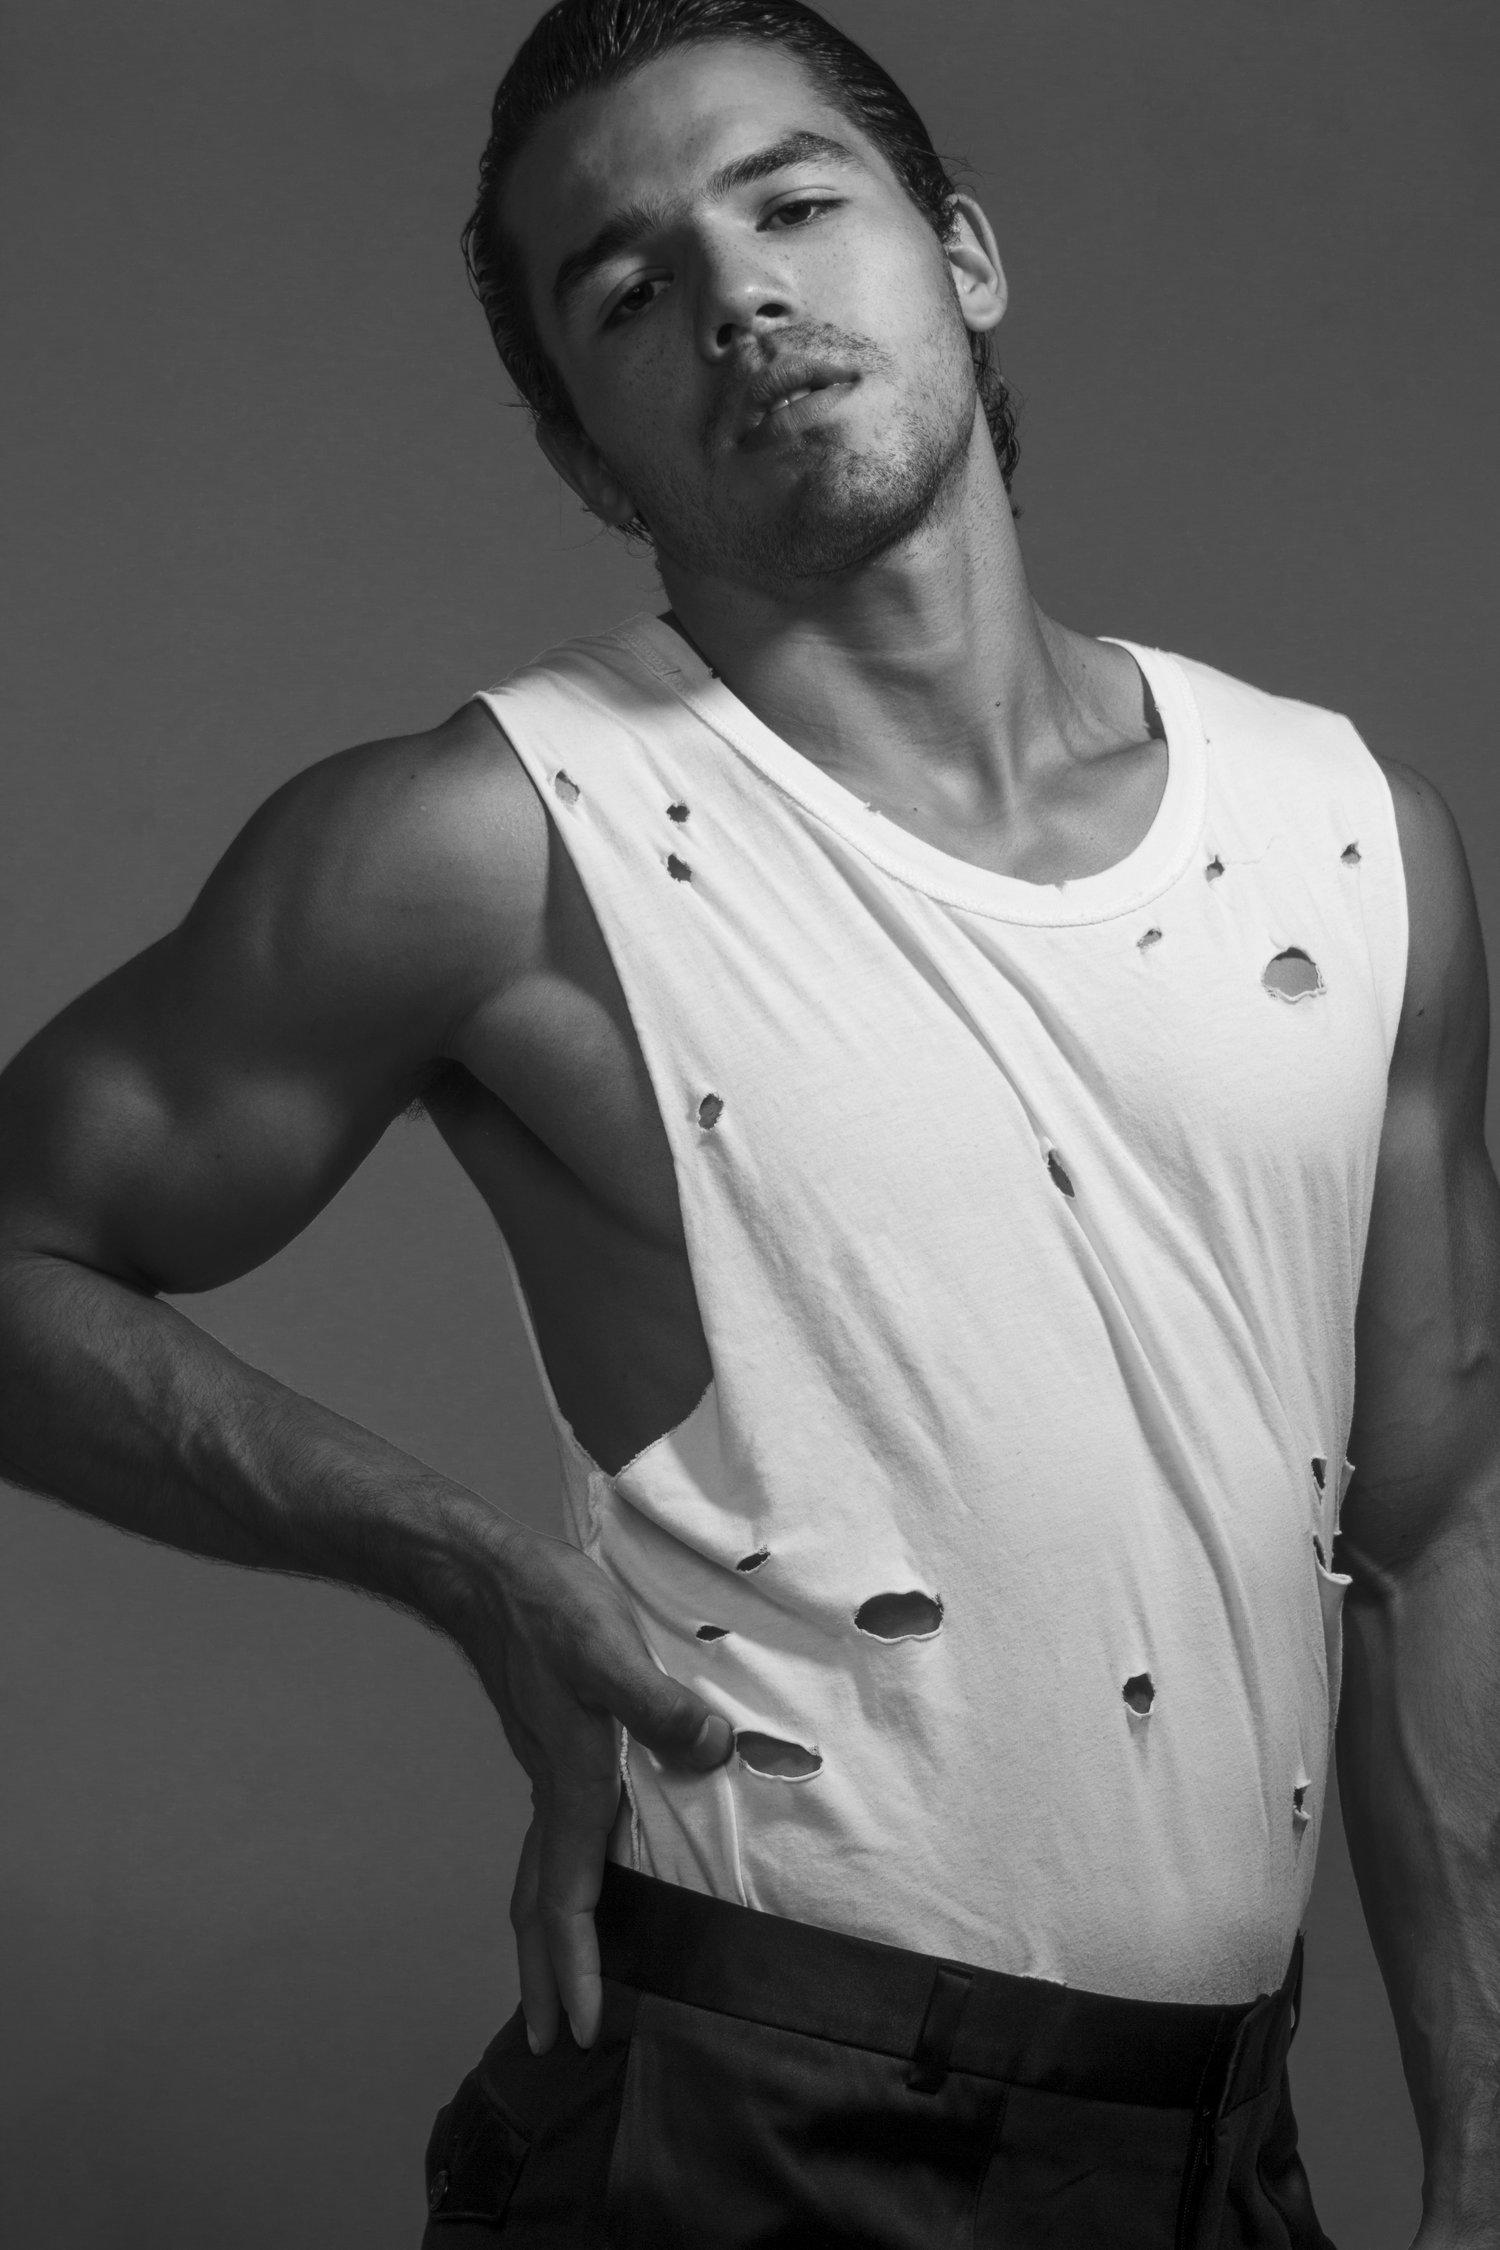 Adon Exclusive: Model Steven Acuña By Yeu Sánchez Valereu